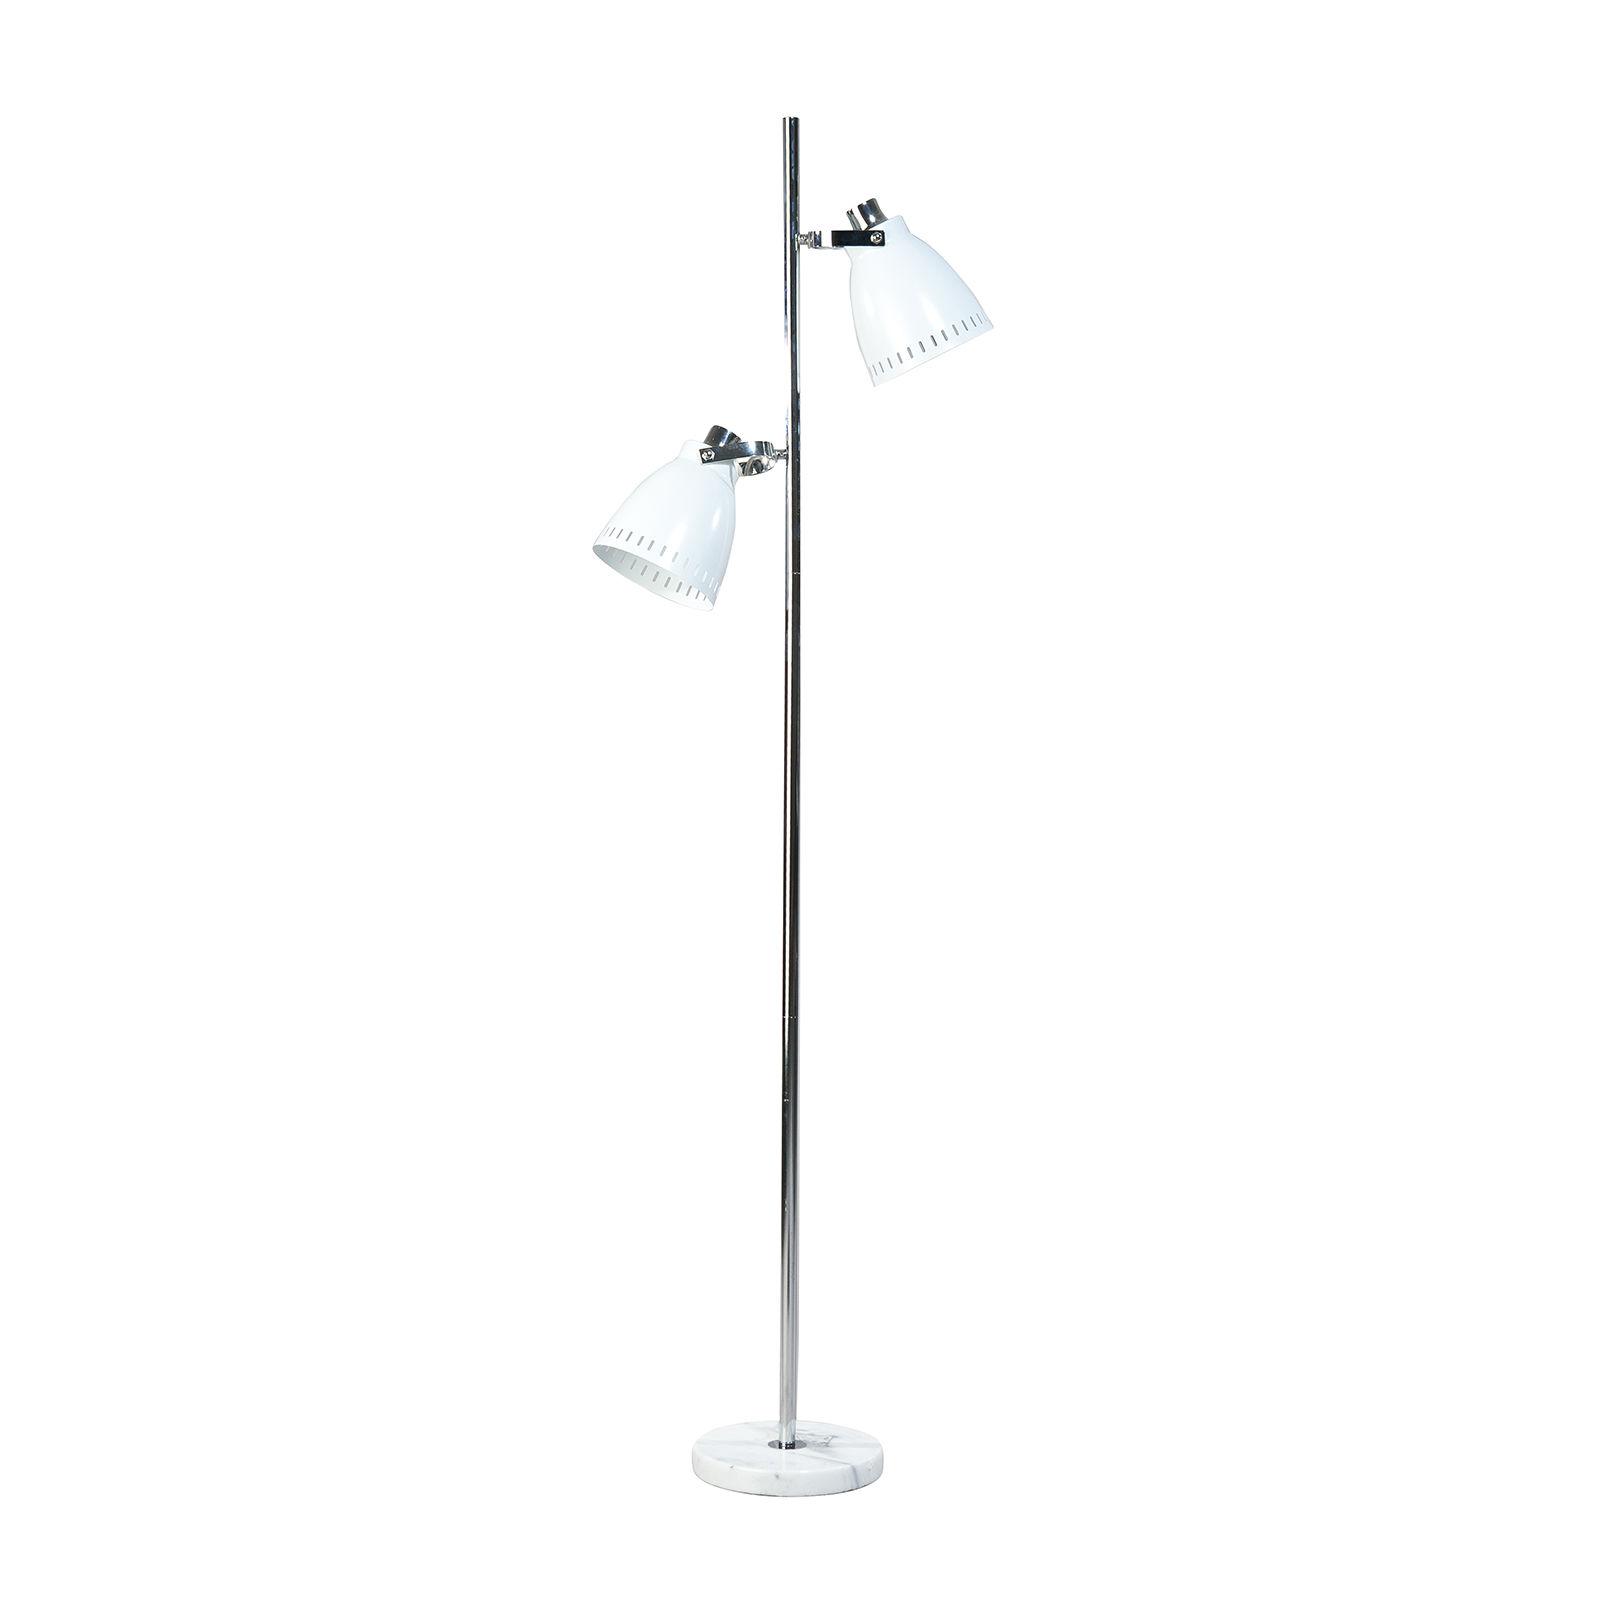 Acate vloerlamp ETH 2x wit/chroom